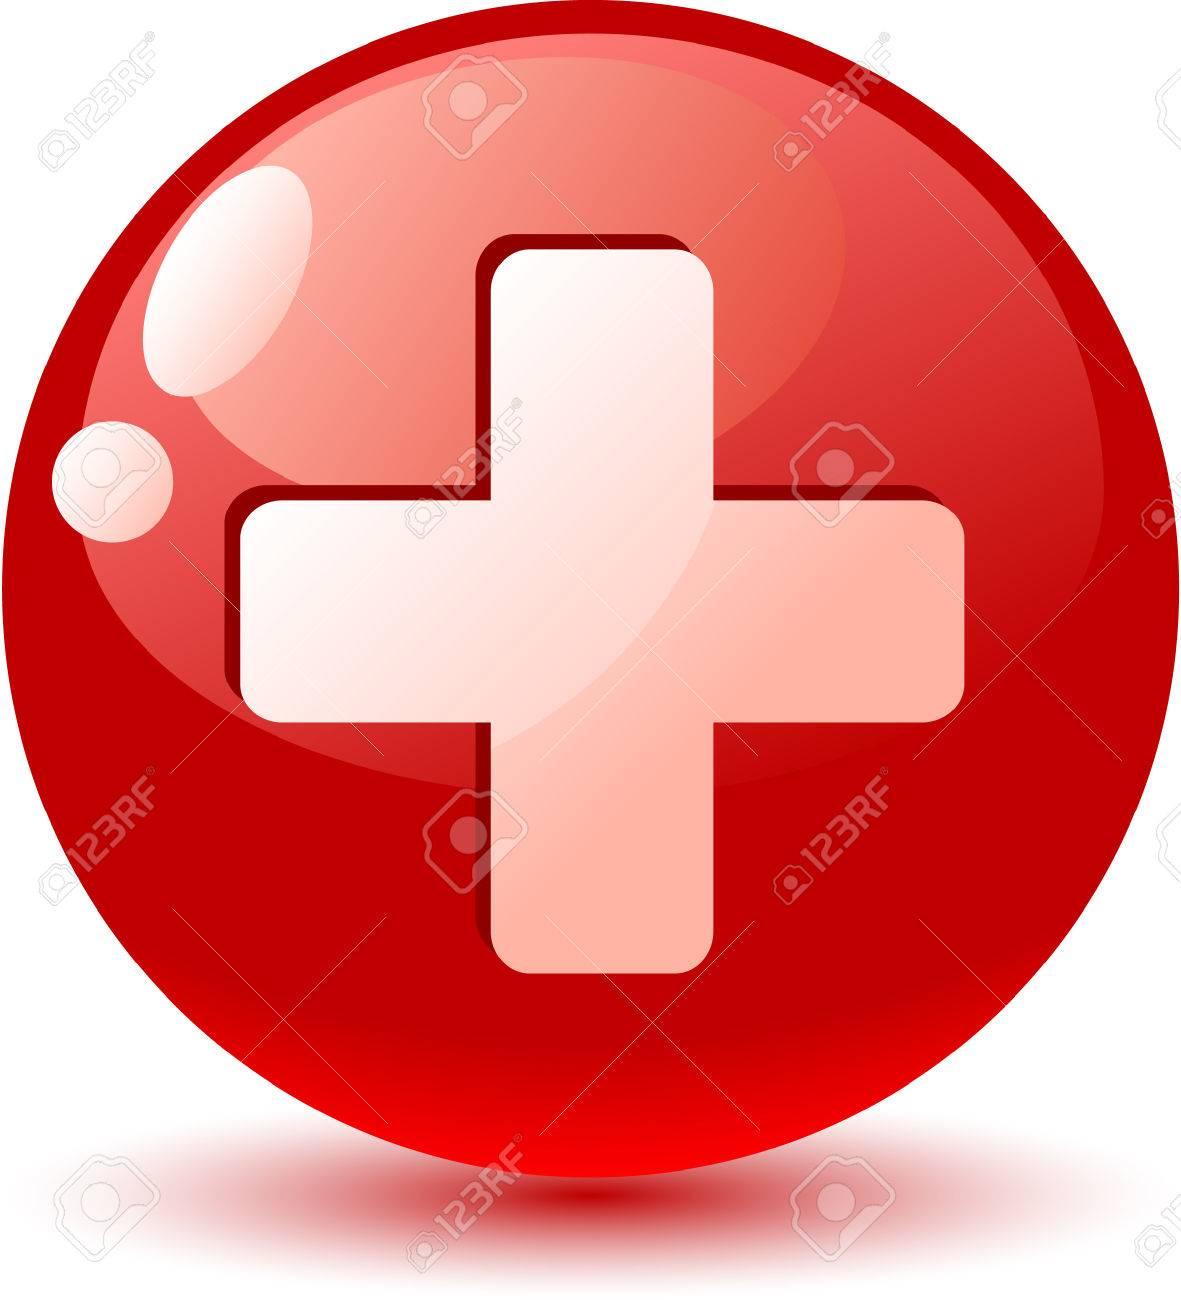 Switzerland flag icon. Vector illustration. Stock Vector - 3986761